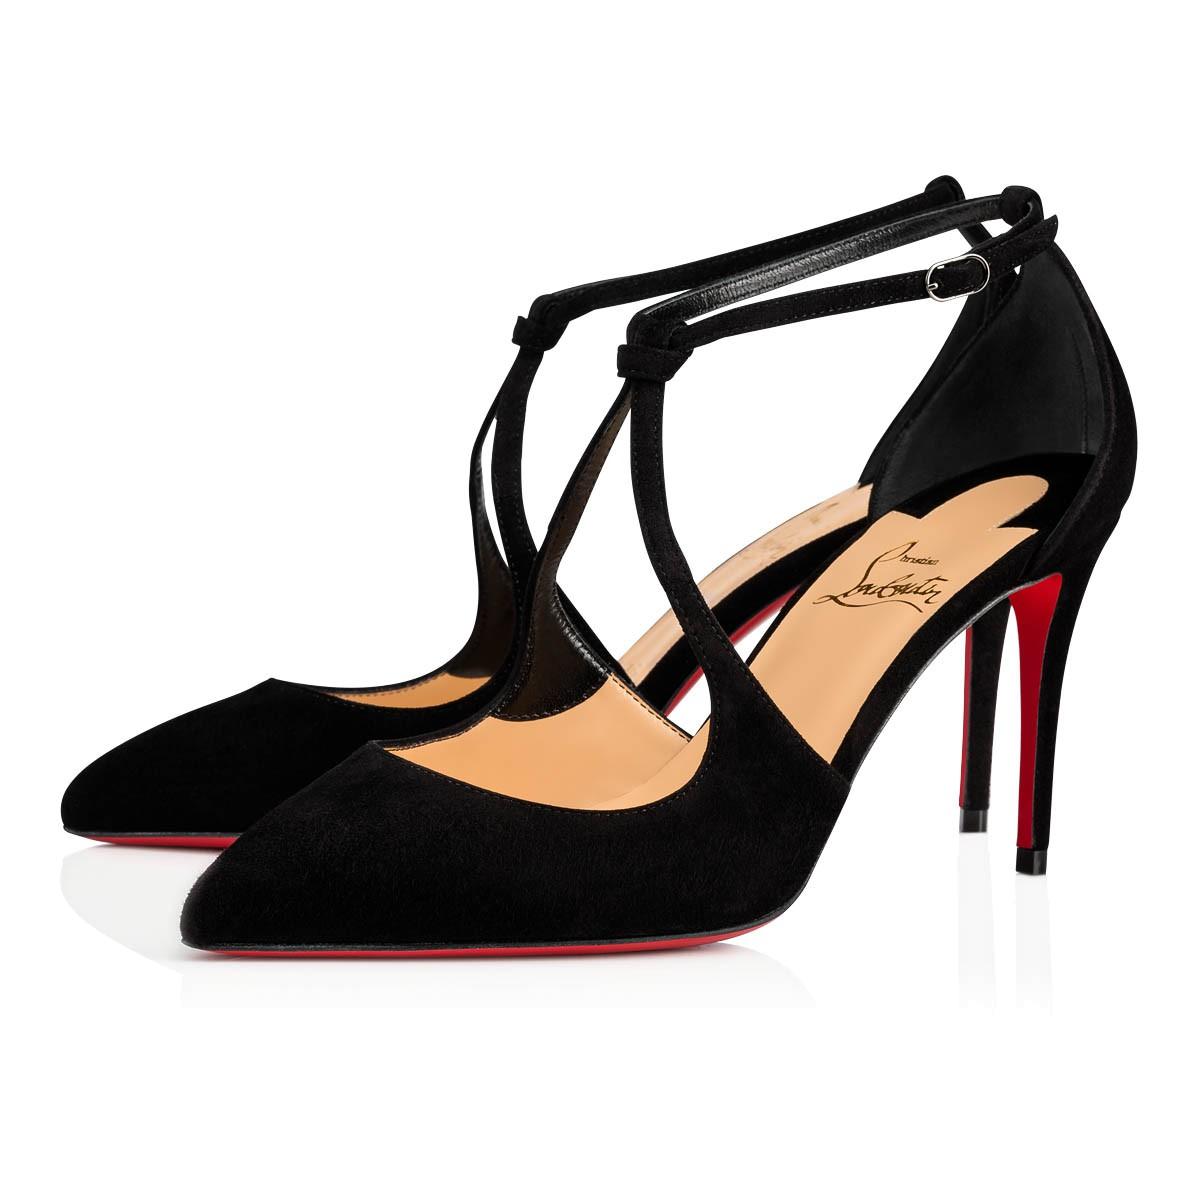 Shoes - Alminetta - Christian Louboutin